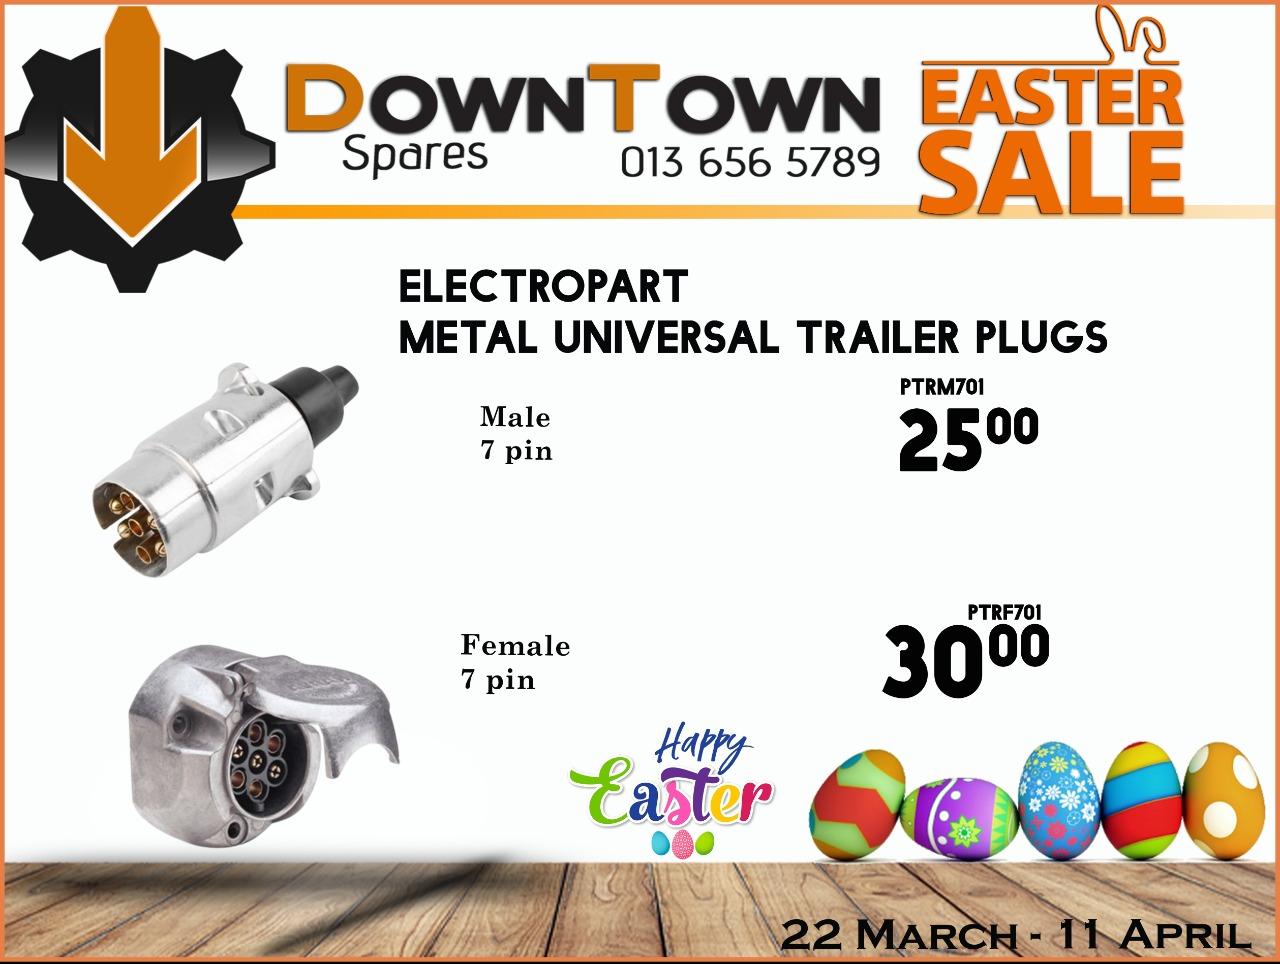 Electropart Metal Universal Trailer Plugs